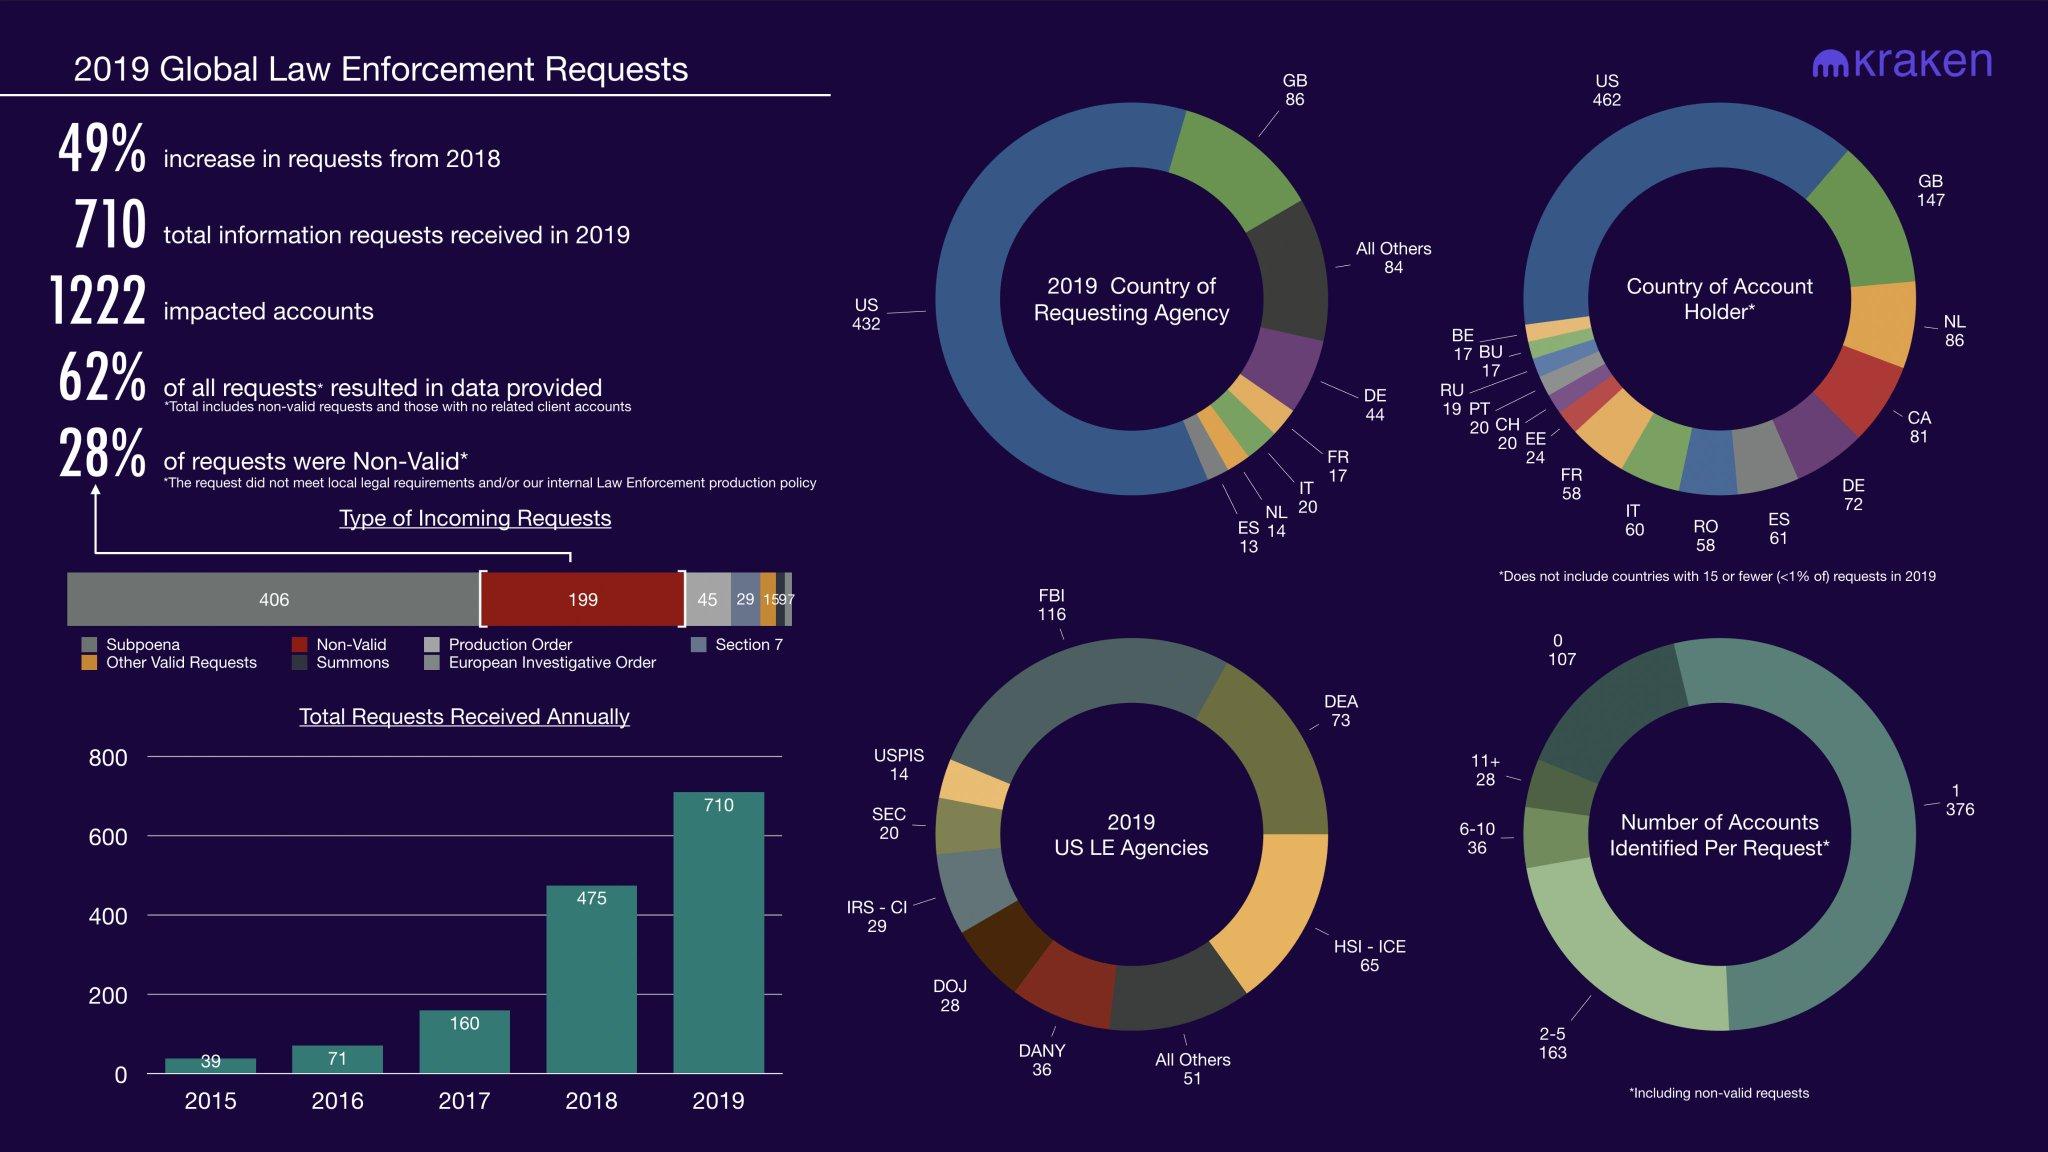 "Kraken revela un aumento del 49% en las investigaciones policiales ""width ="" 2048 ""height ="" 1152 ""srcset = ""https://blackswanfinances.com/wp-content/uploads/2020/01/kraken-report.jpg 2048w, https://news.bitcoin.com/wp-content/uploads/2020/01/kraken- report-300x169.jpg 300w, https://news.bitcoin.com/wp-content/uploads/2020/01/kraken-report-1024x576.jpg 1024w, https://news.bitcoin.com/wp-content/ uploads / 2020/01 / kraken-report-768x432.jpg 768w, https://news.bitcoin.com/wp-content/uploads/2020/01/kraken-report-1536x864.jpg 1536w, https: // noticias. bitcoin.com/wp-content/uploads/2020/01/kraken-report-696x392.jpg 696w, https://news.bitcoin.com/wp-content/uploads/2020/01/kraken-report-1392x783.jpg 1392w, https://news.bitcoin.com/wp-content/uploads/2020/01/kraken-report-1068x601.jpg 1068w, https://news.bitcoin.com/wp-content/uploads/2020/01 /kraken-report-747x420.jpg 747w, https: // noticias. bitcoin.com/wp-content/uploads/2020/01/kraken-report-1920x1080.jpg 1920w ""tamaños ="" (ancho máximo: 2048px) 100vw, 2048px"